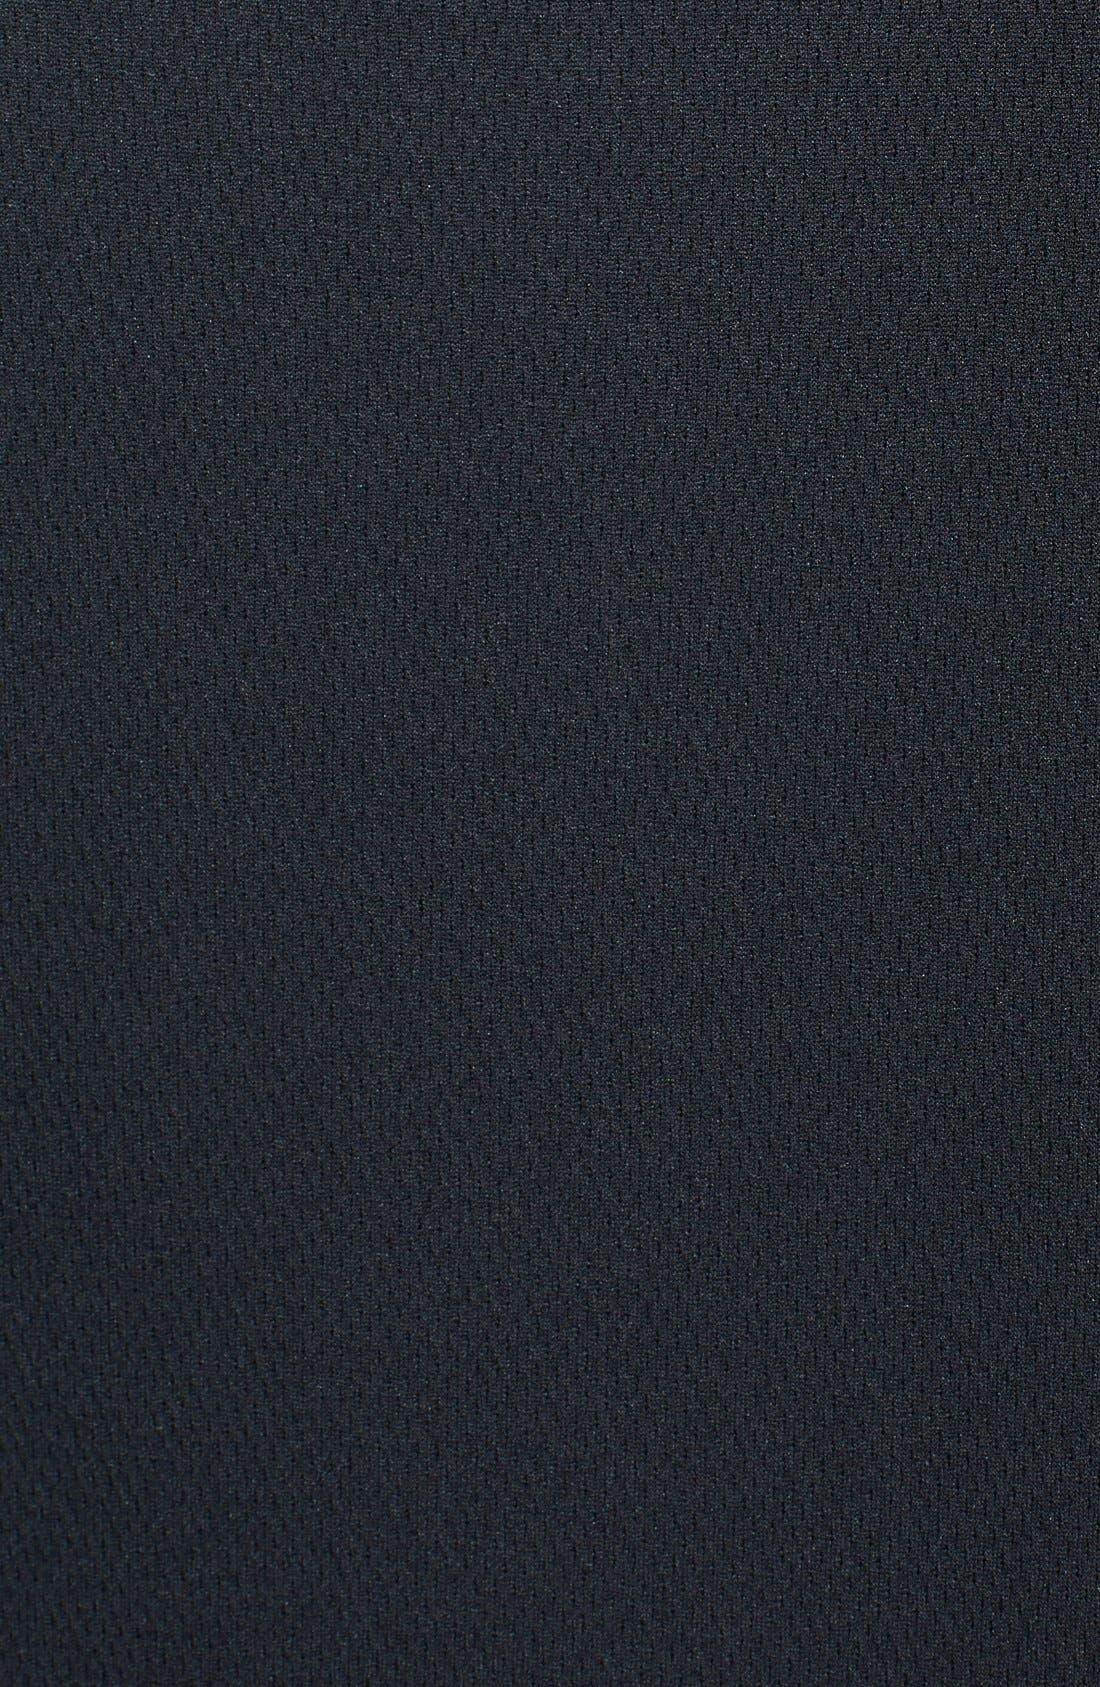 Pittsburgh Steelers - Edge DryTec Moisture Wicking Half Zip Pullover,                             Alternate thumbnail 3, color,                             001